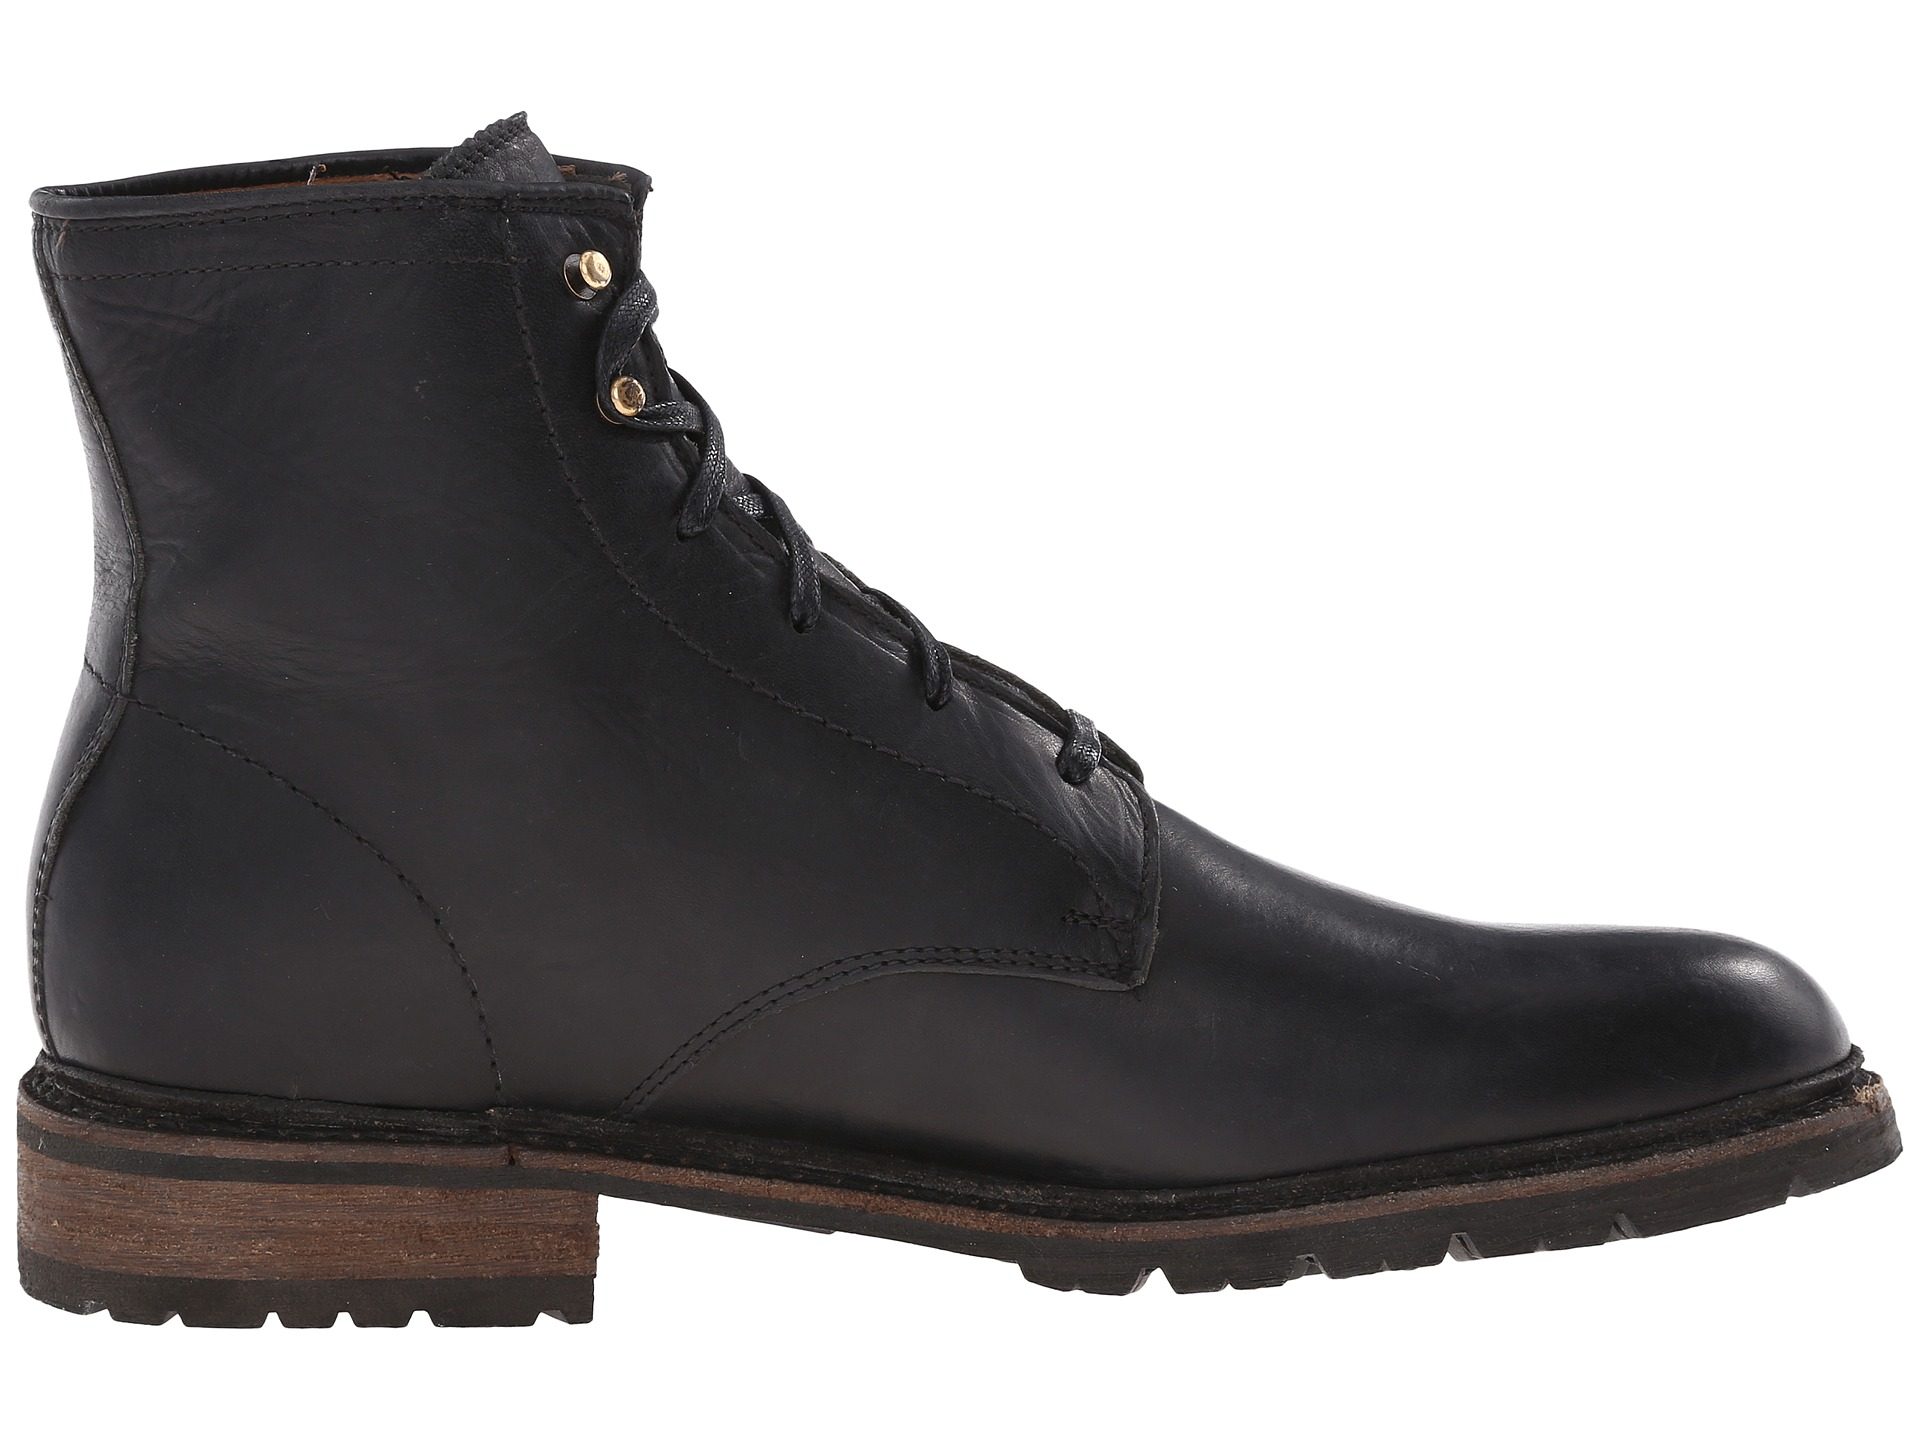 Frye Boot Shoe Laces